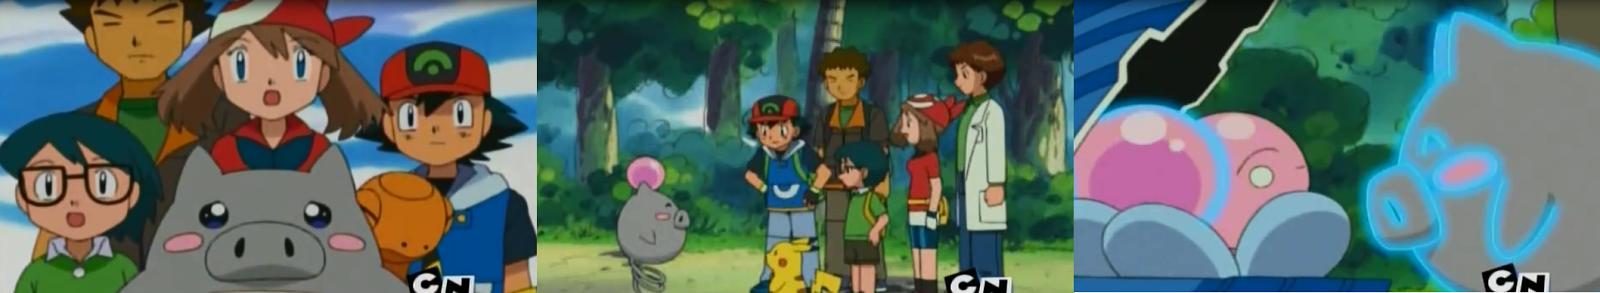 Pokemon Capitulo 1 Temporada 8 Perlas De Sabiduria